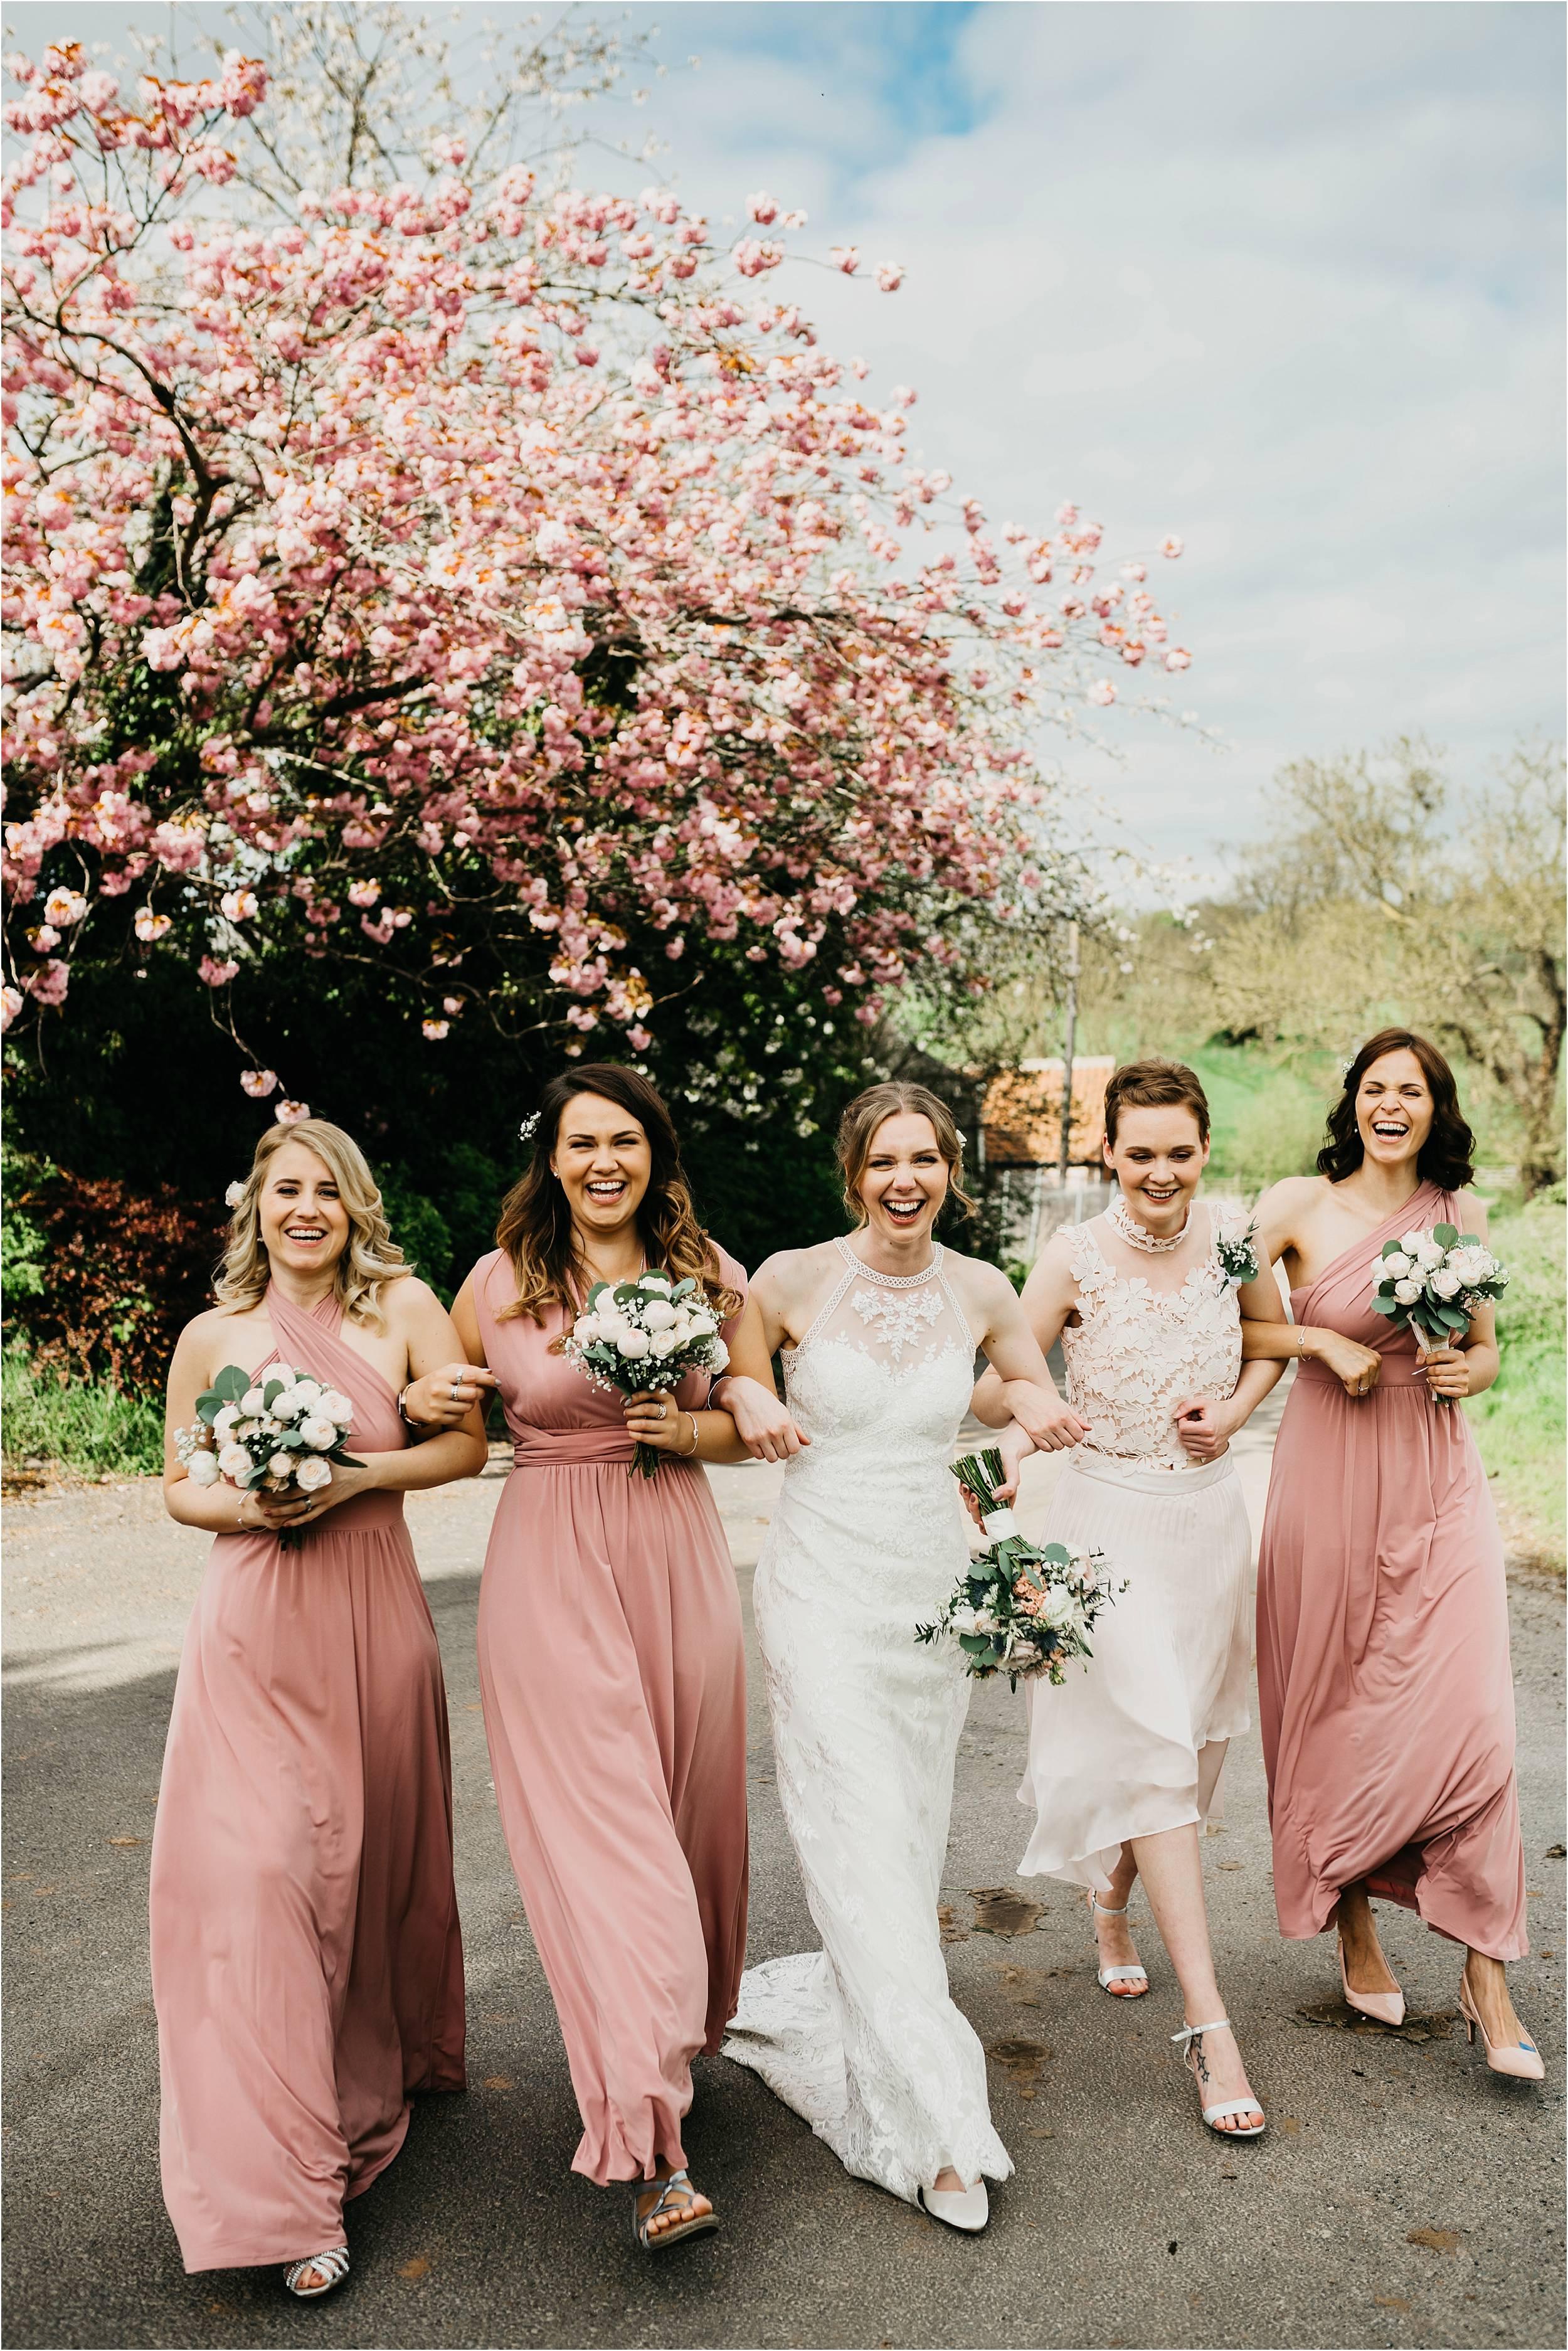 Kedleston Country House Wedding Photography_0075.jpg